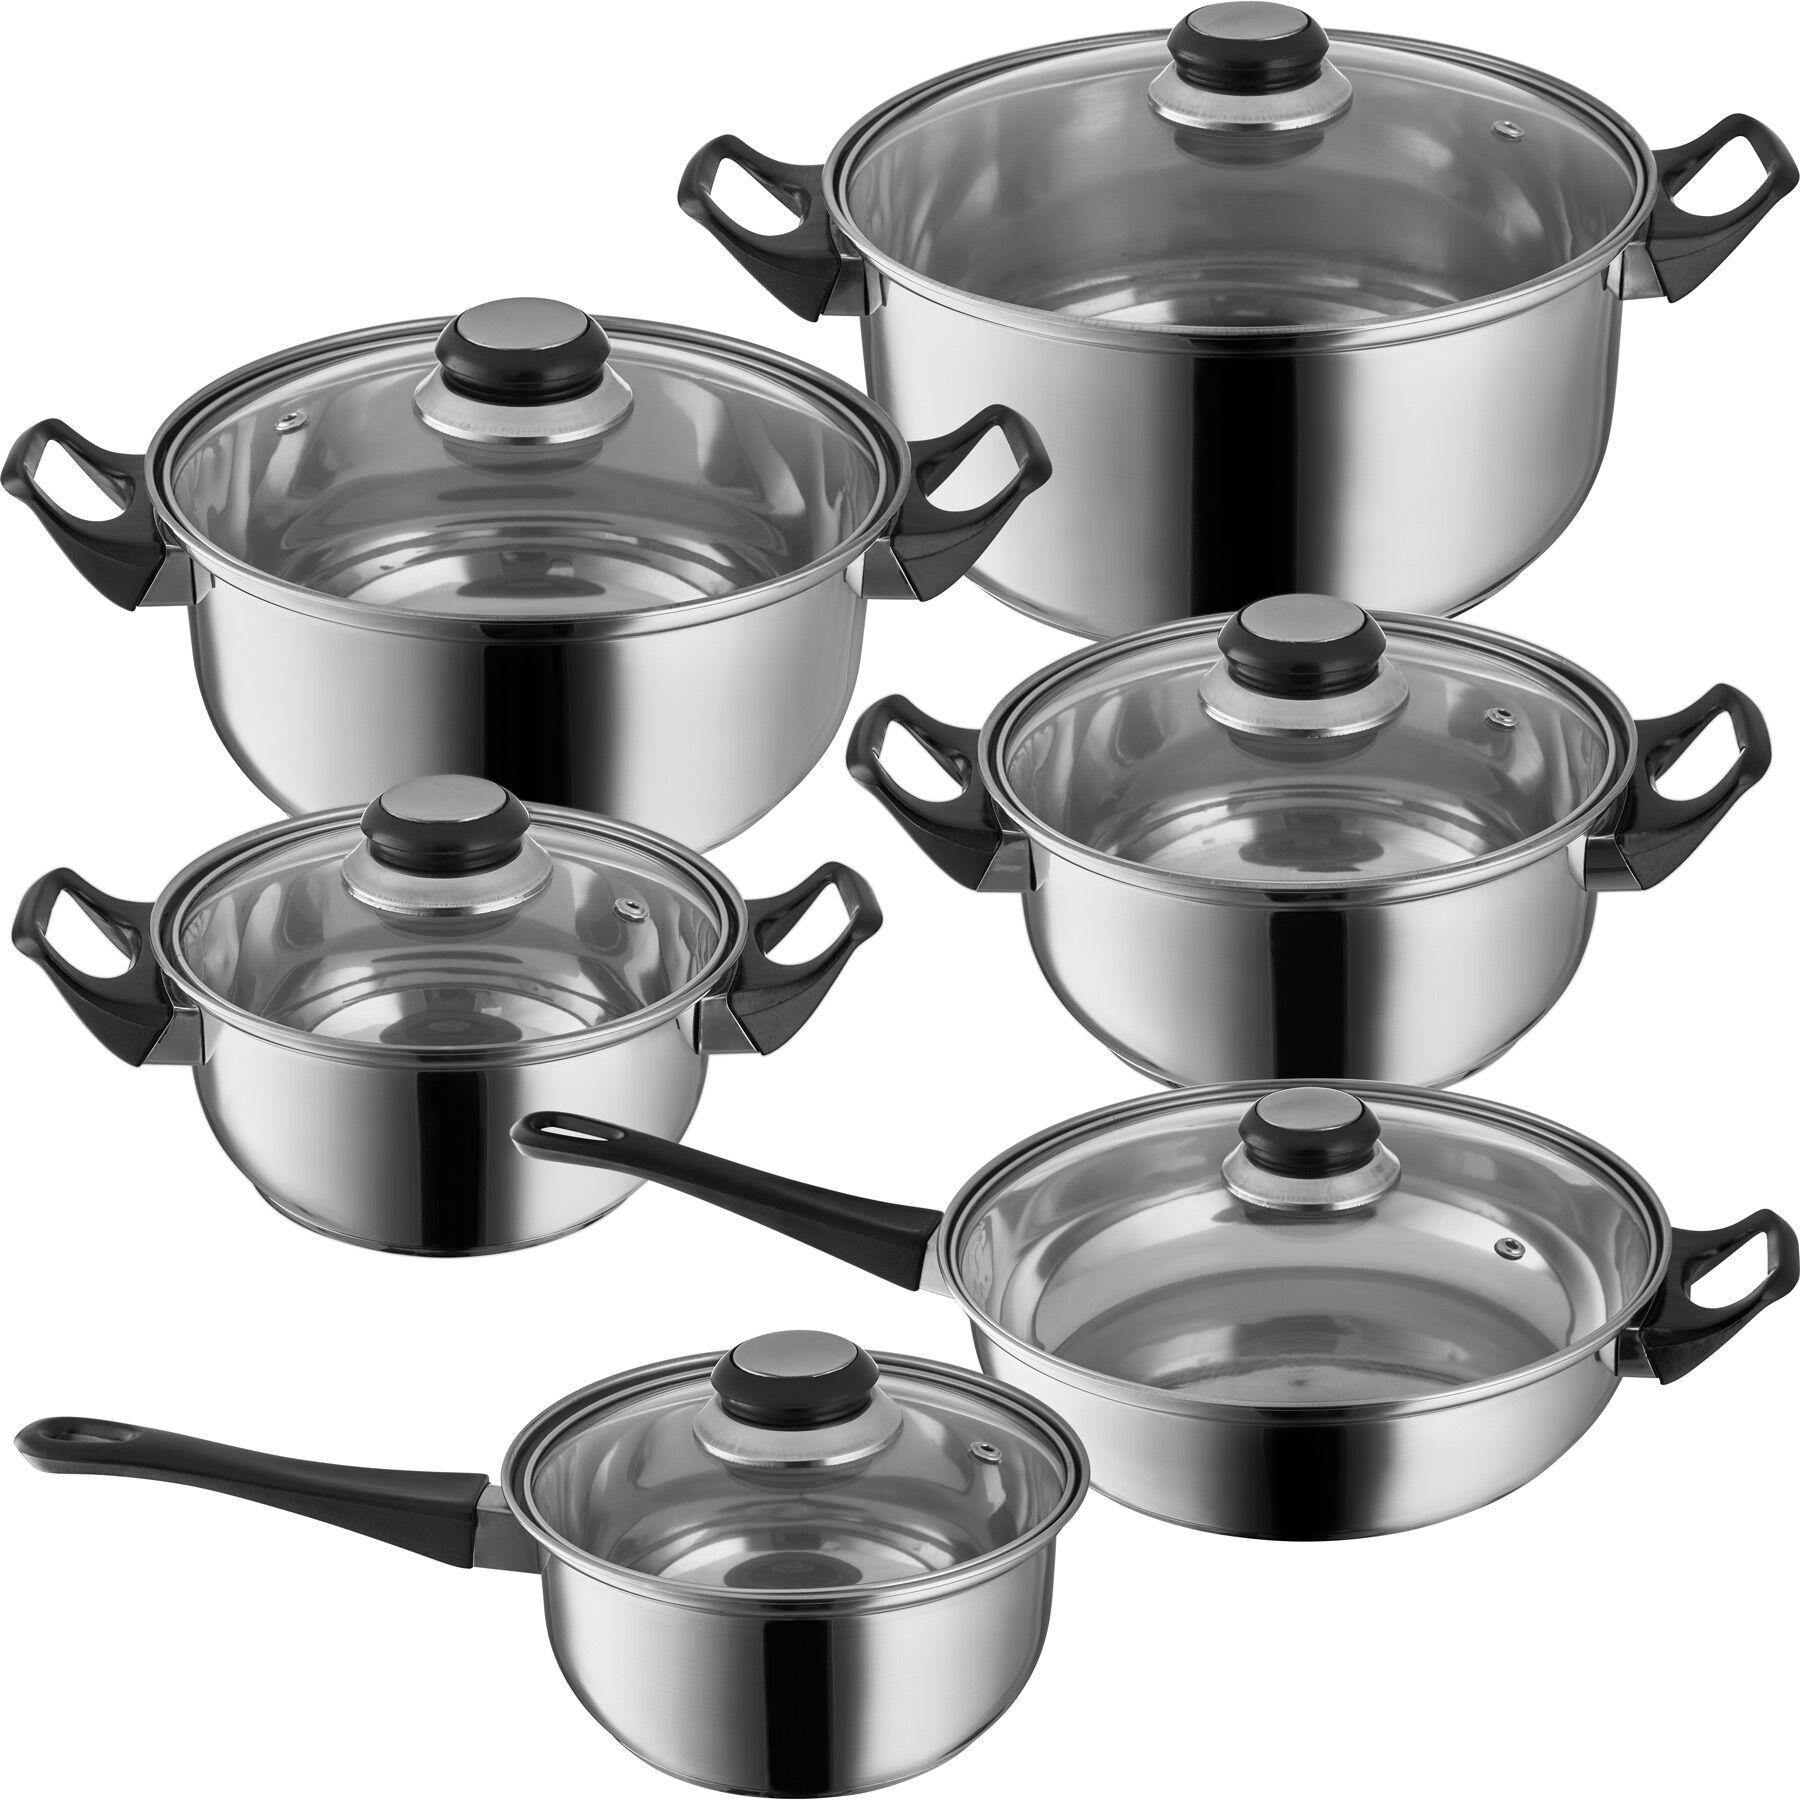 tectake Grydesæt, 12 dele i rustfrit stål inkl. låg - sølv